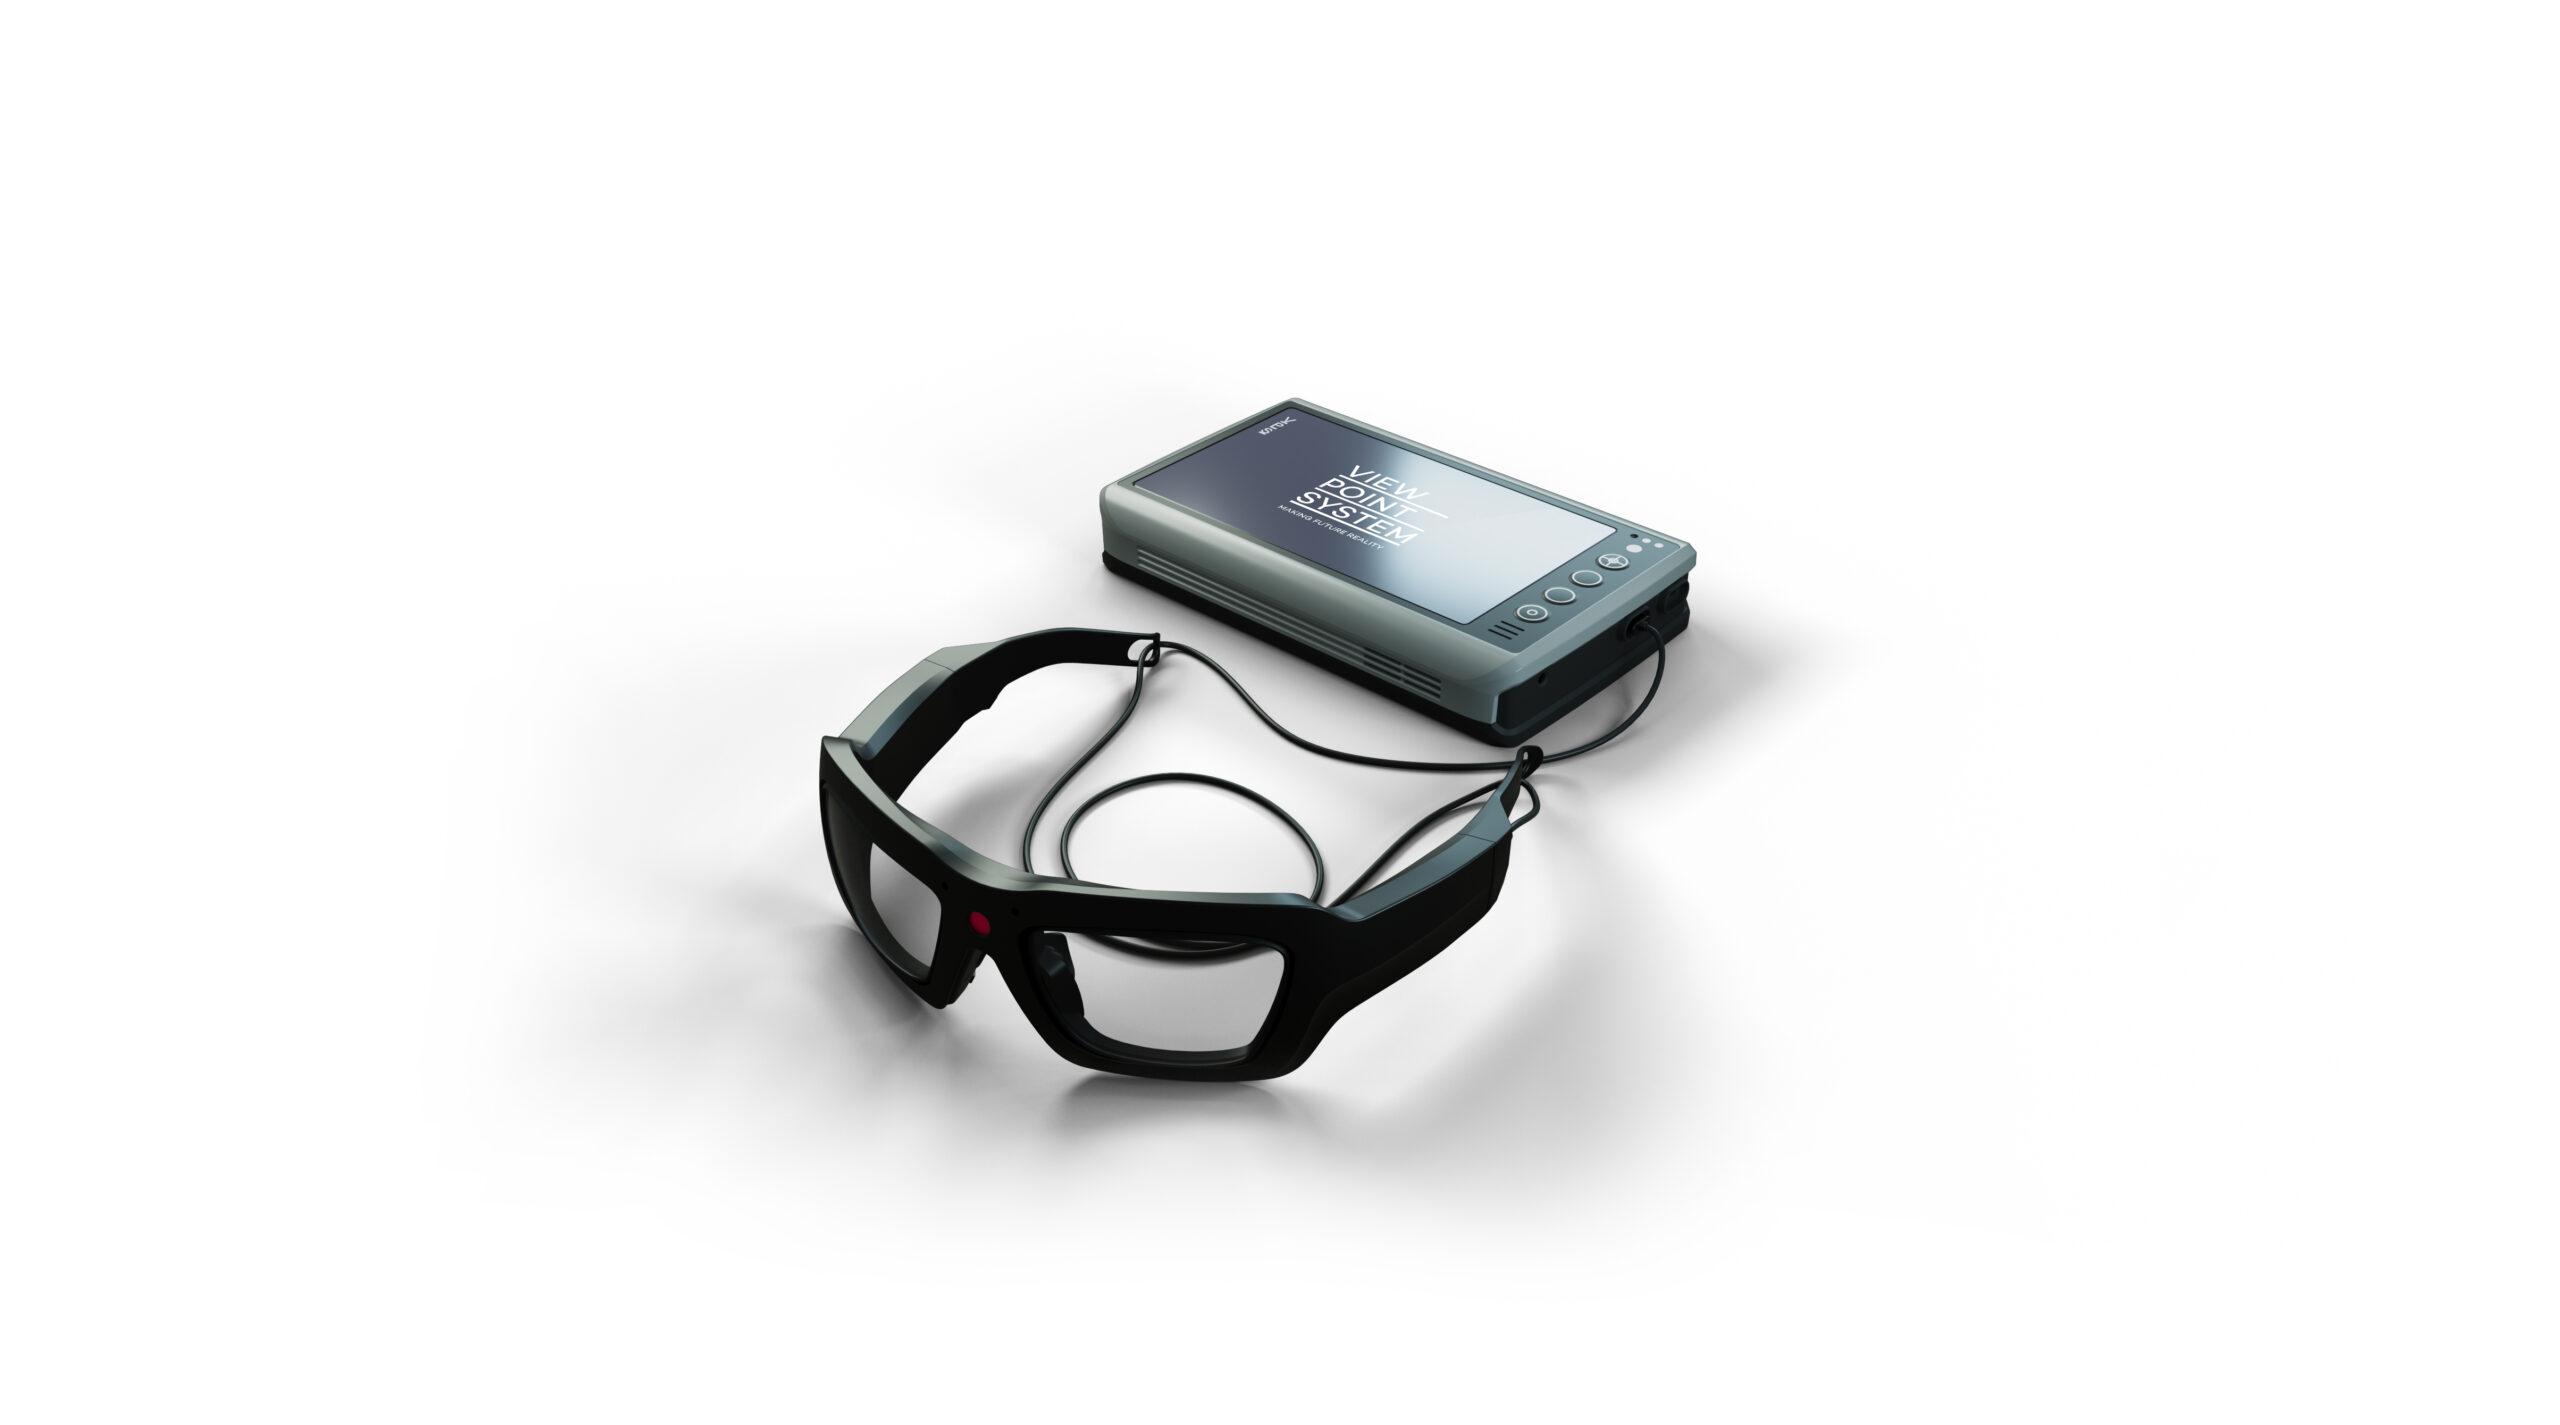 VPS 19 smart glasses incl. smart unit